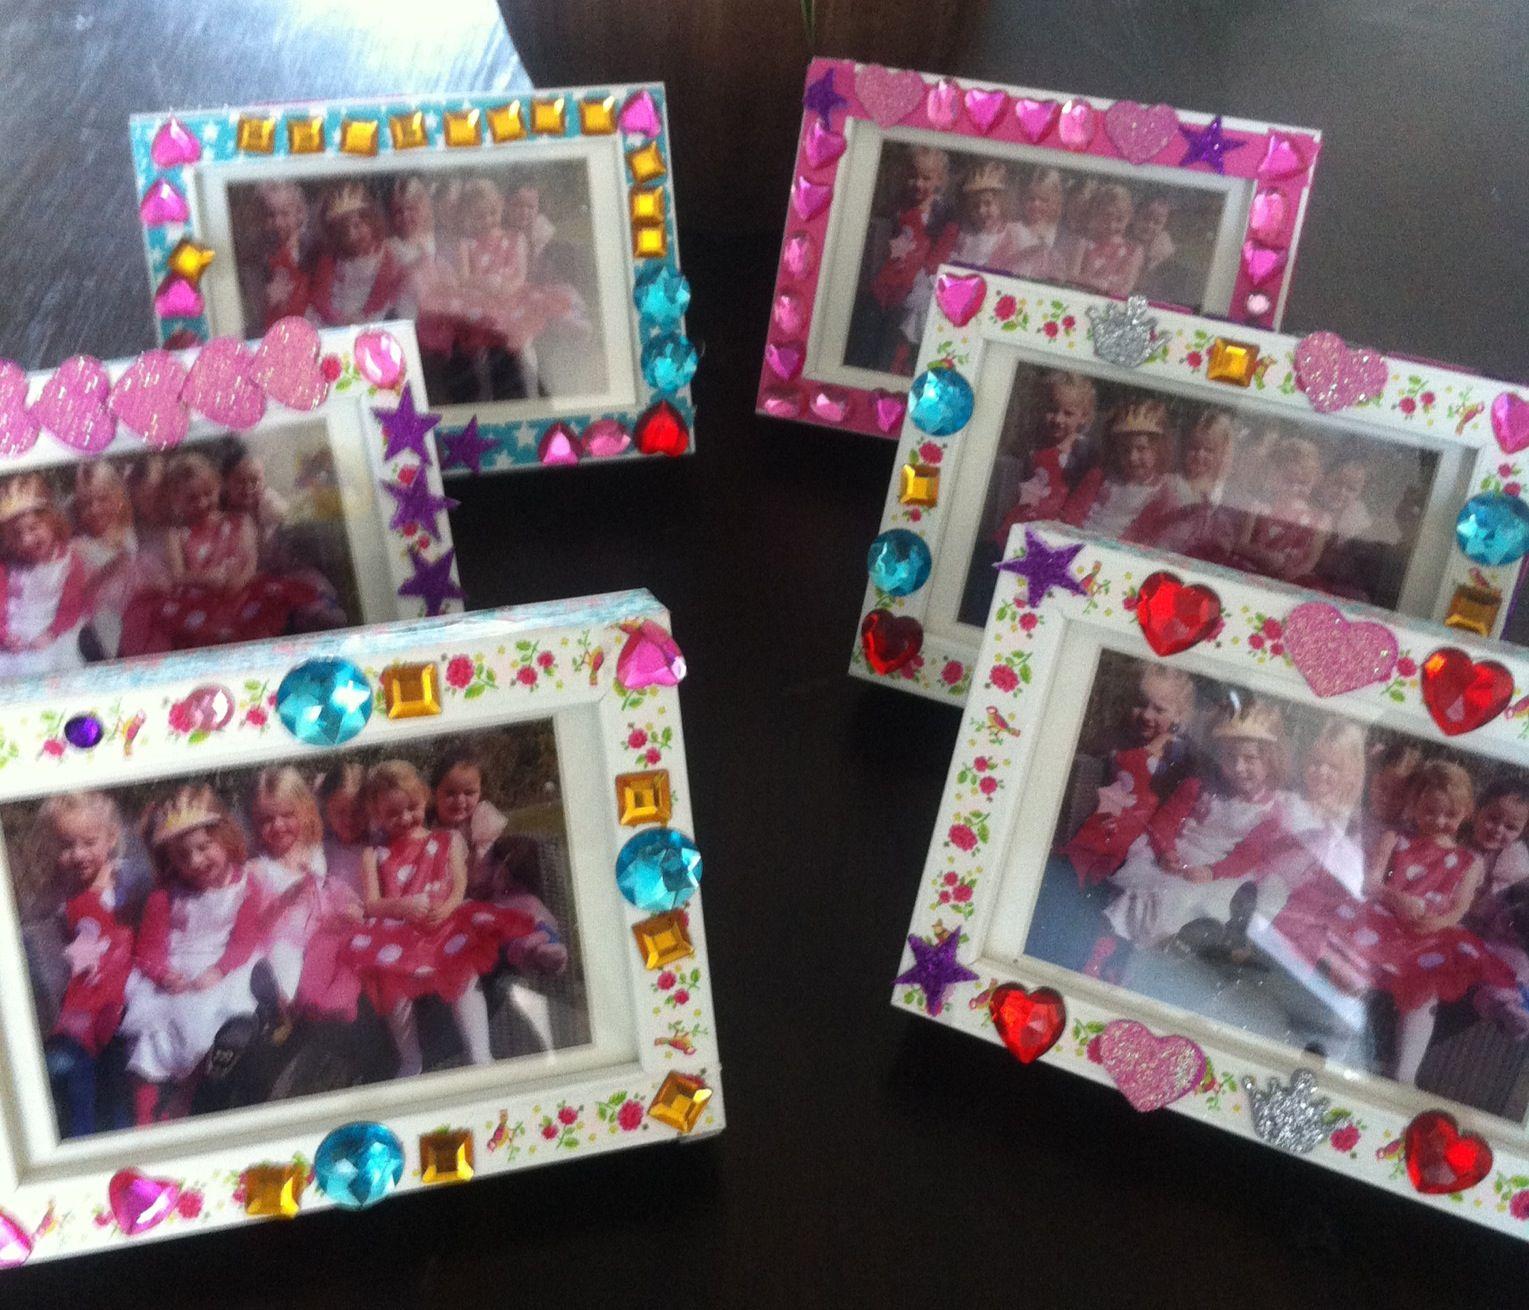 Geliefde Kinderfeestje Sophie: zelf fotolijstje versieren. Zo cute &RK66